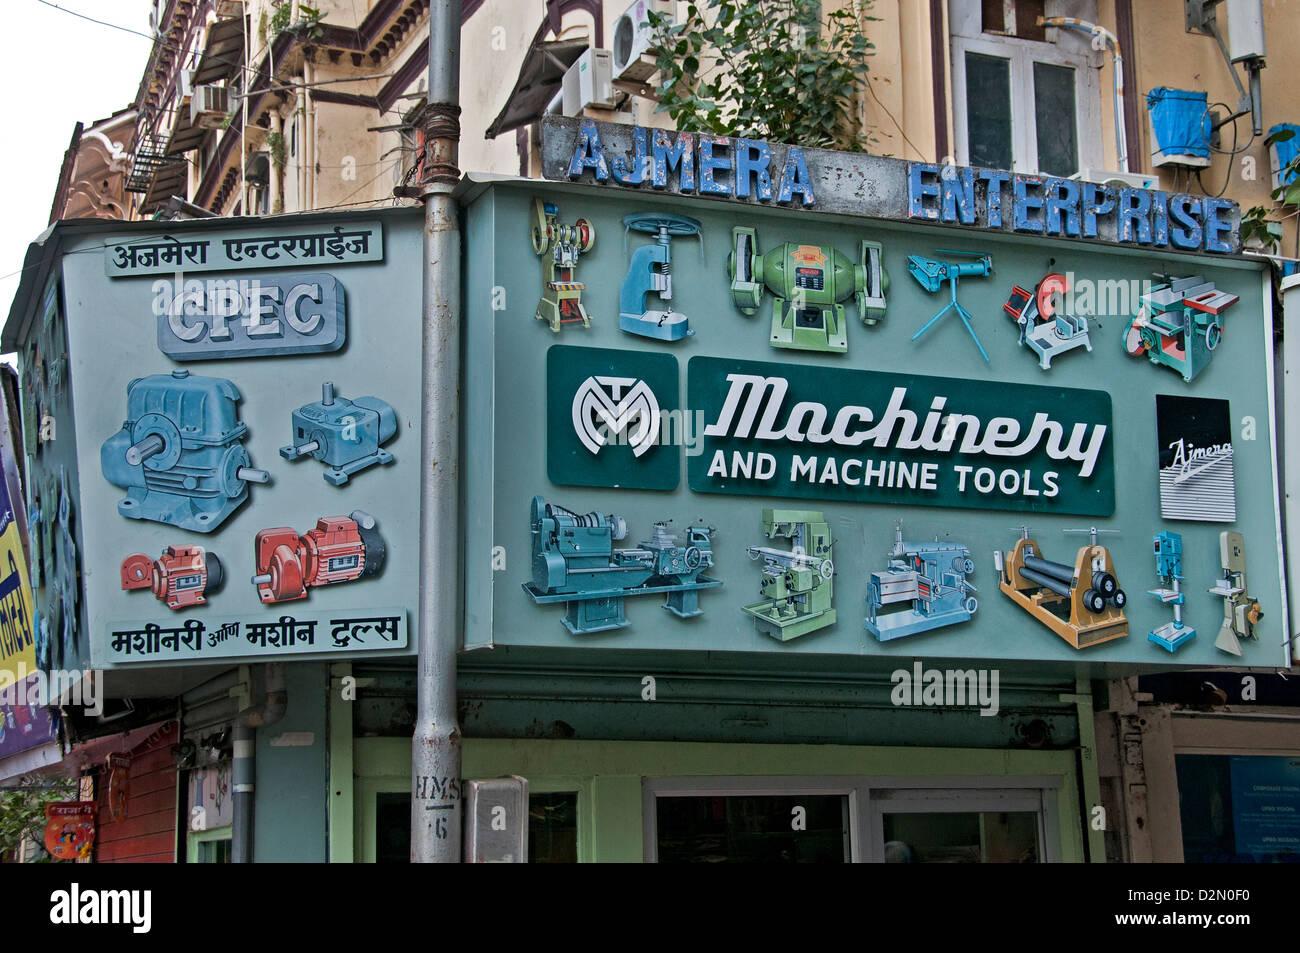 Mumbai ( Bombay ) India macchinari tramite Affissioni Immagini Stock